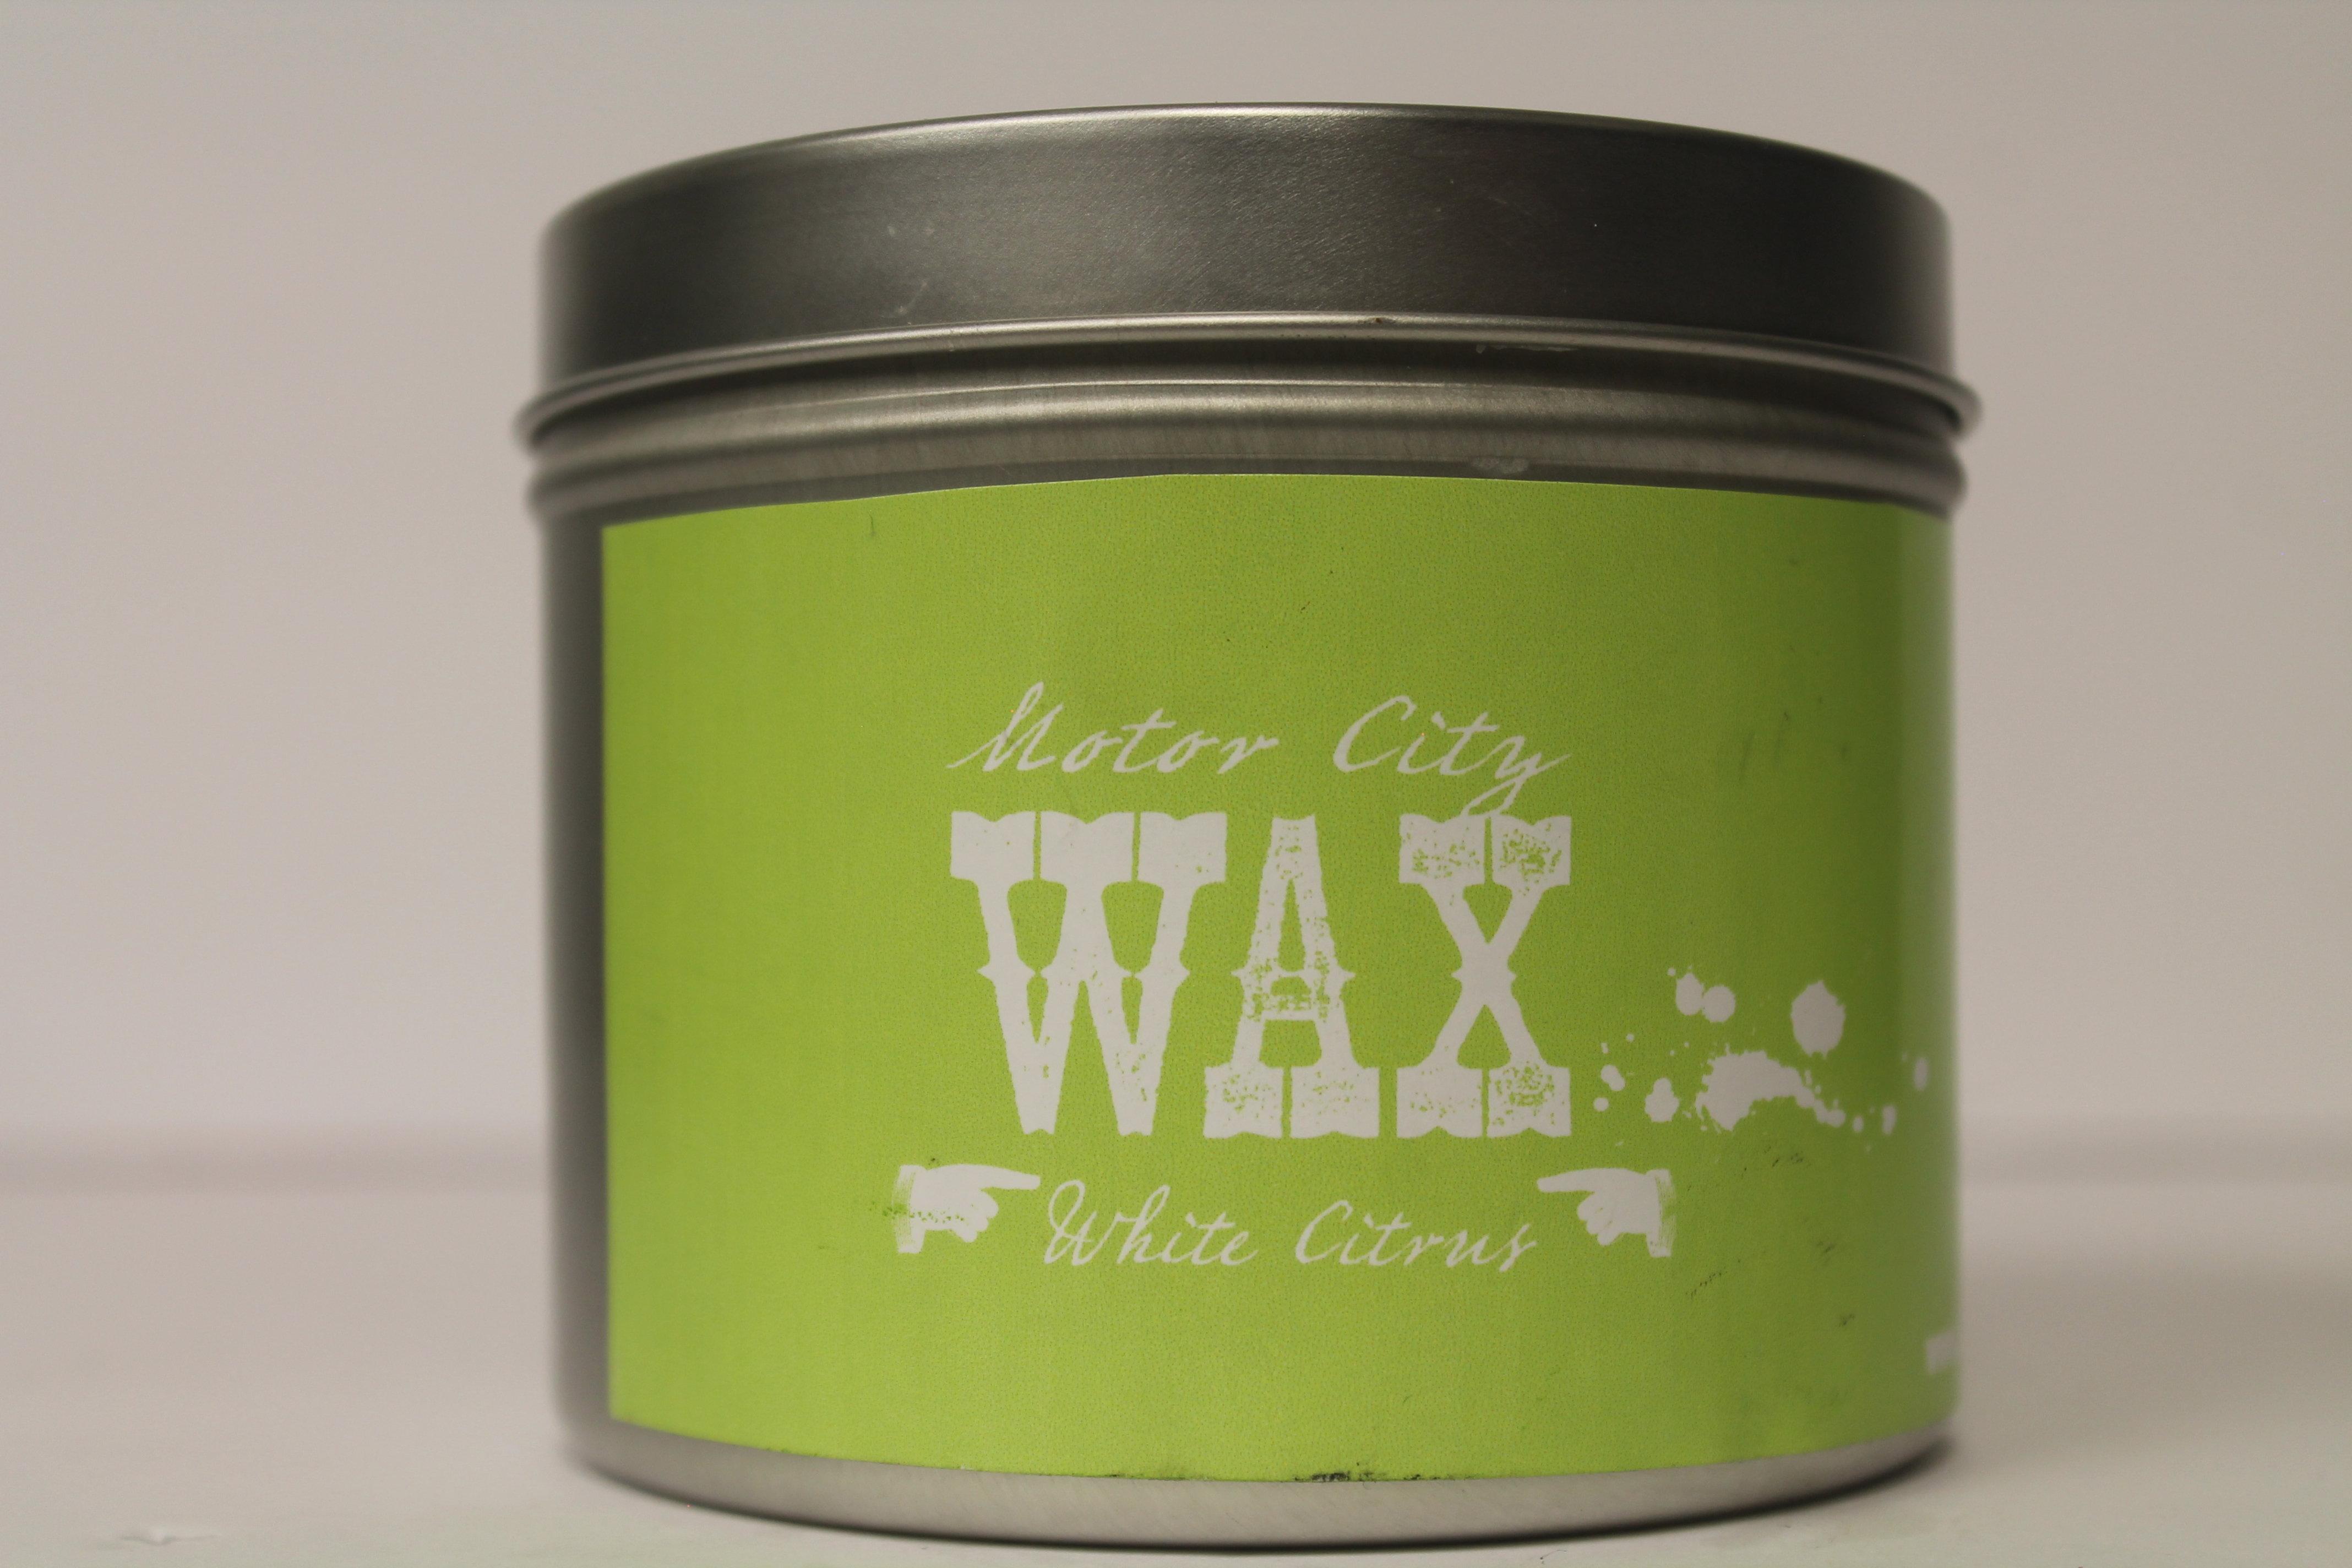 Motor City Wax 00101